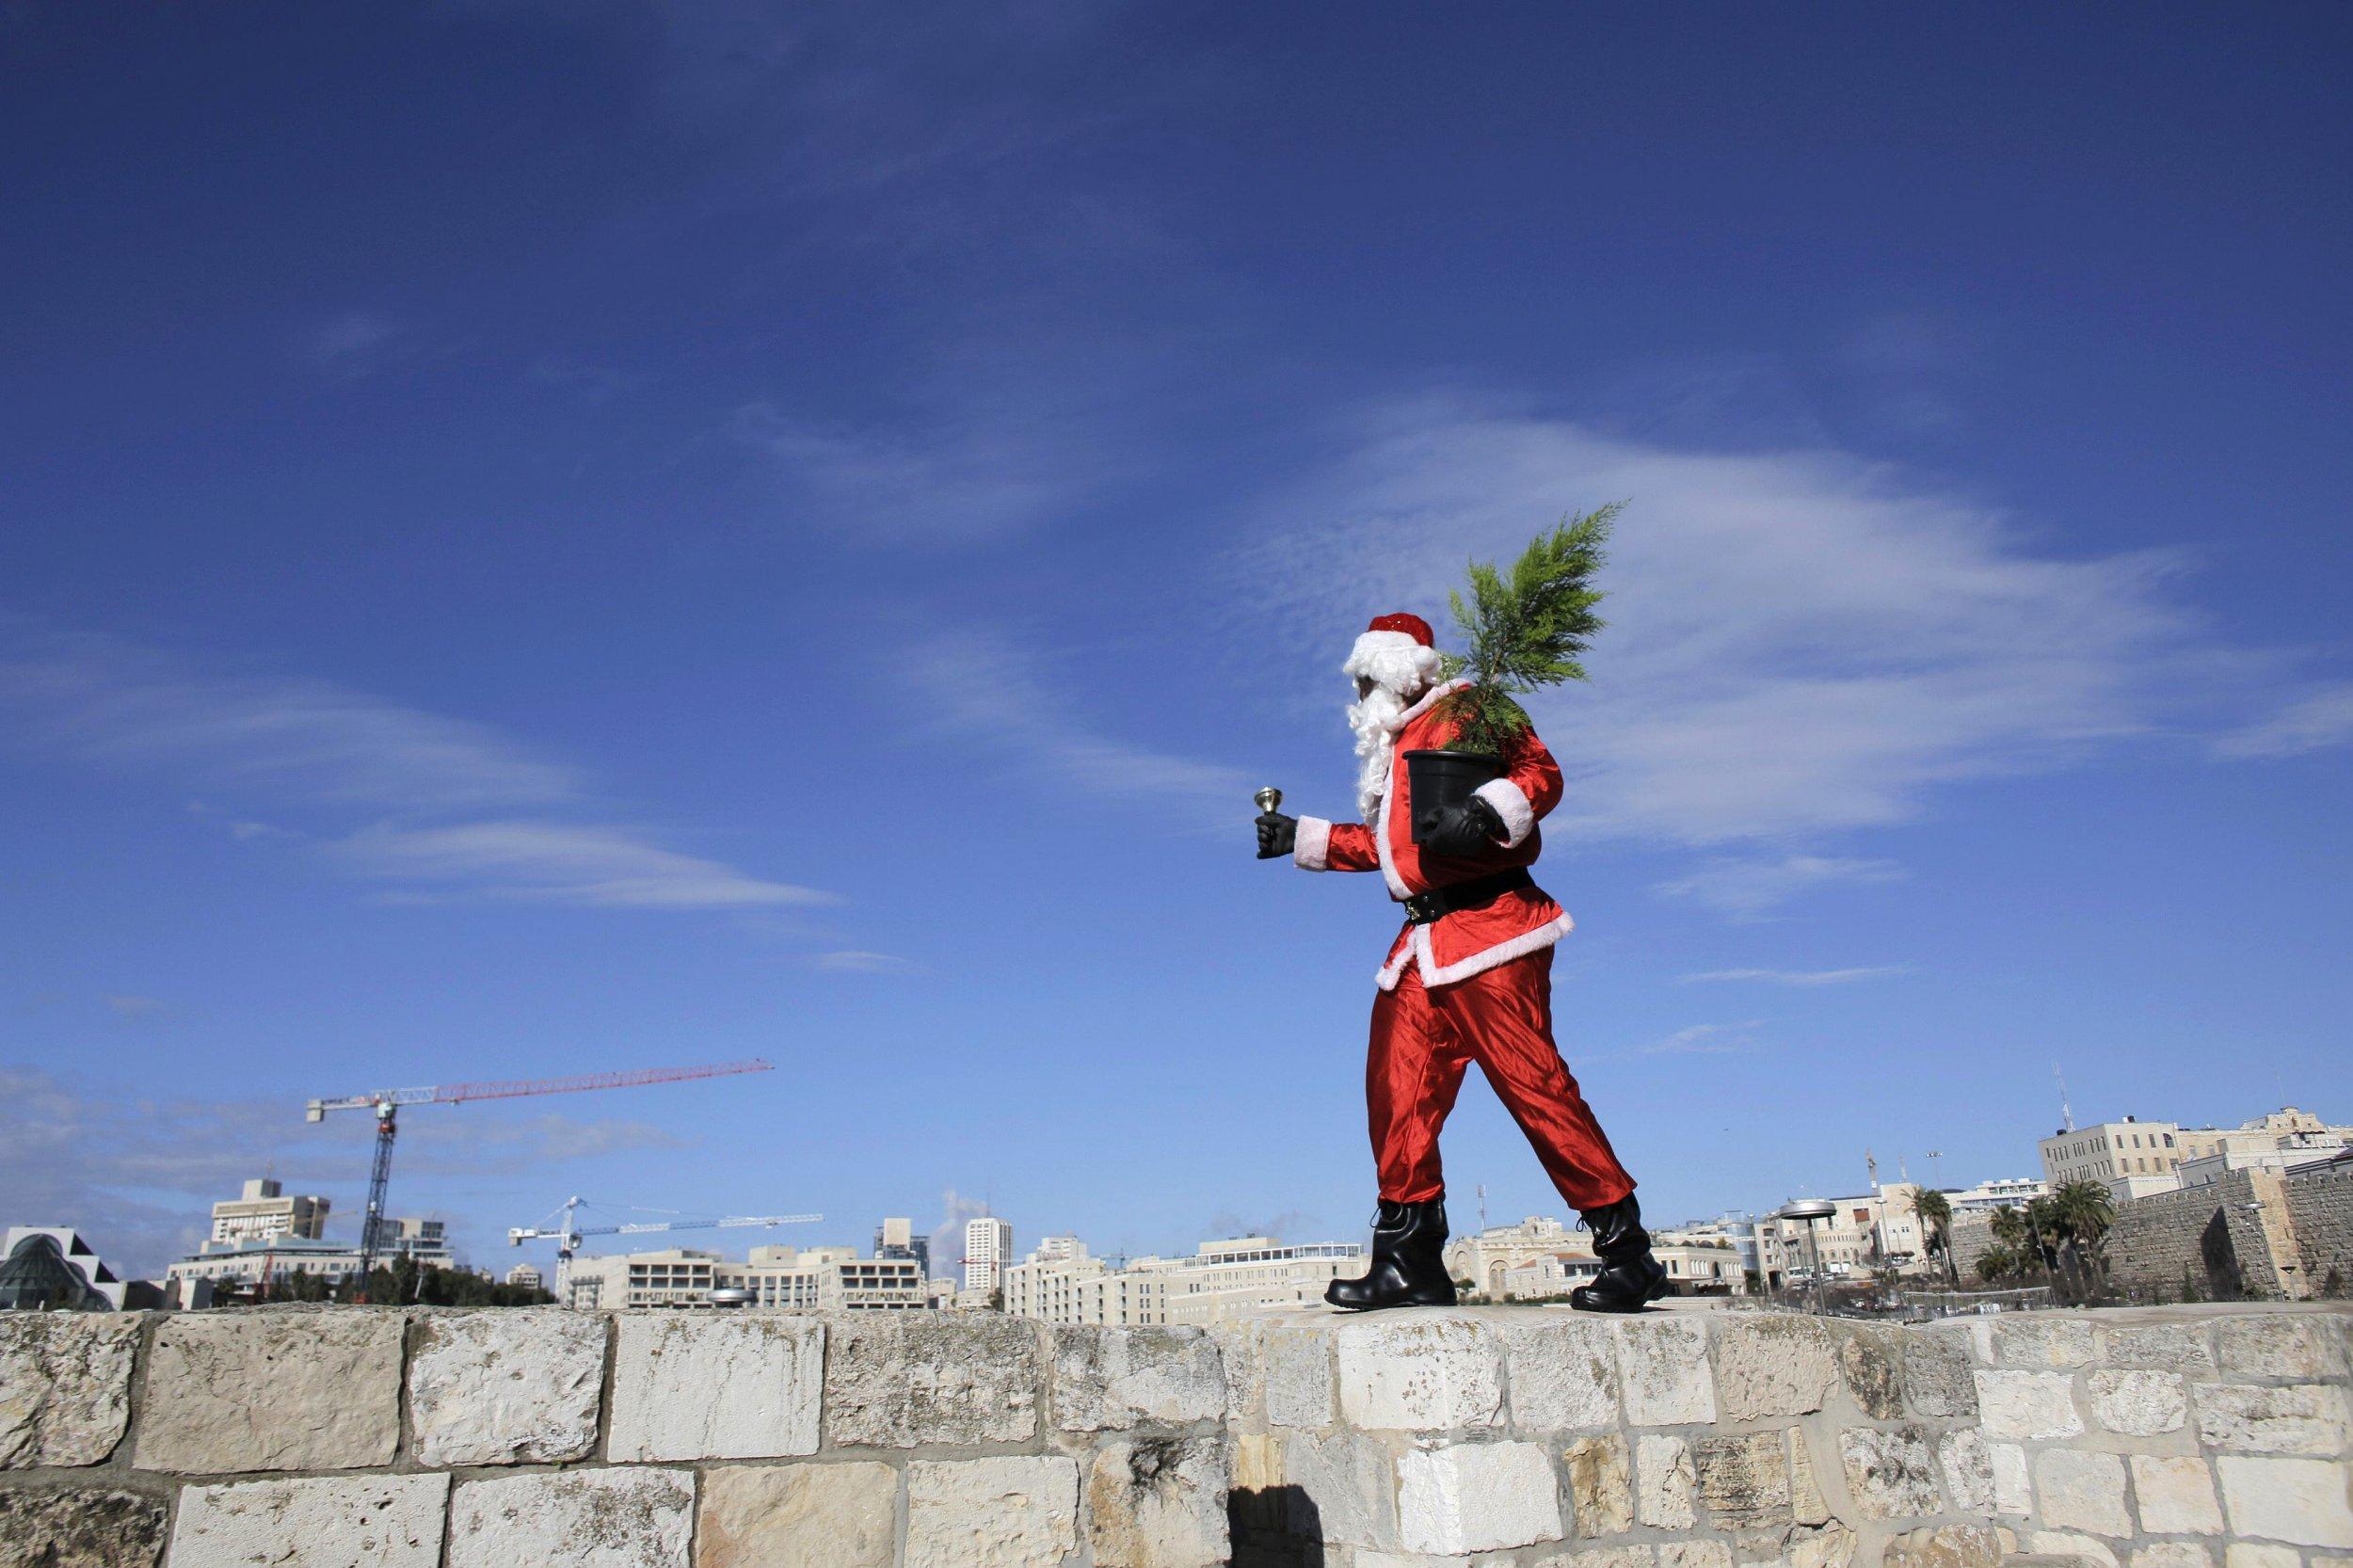 2014-12-22T103842Z_1674561334_GM1EACM1FOM01_RTRMADP_3_MIDEAST-ISRAEL